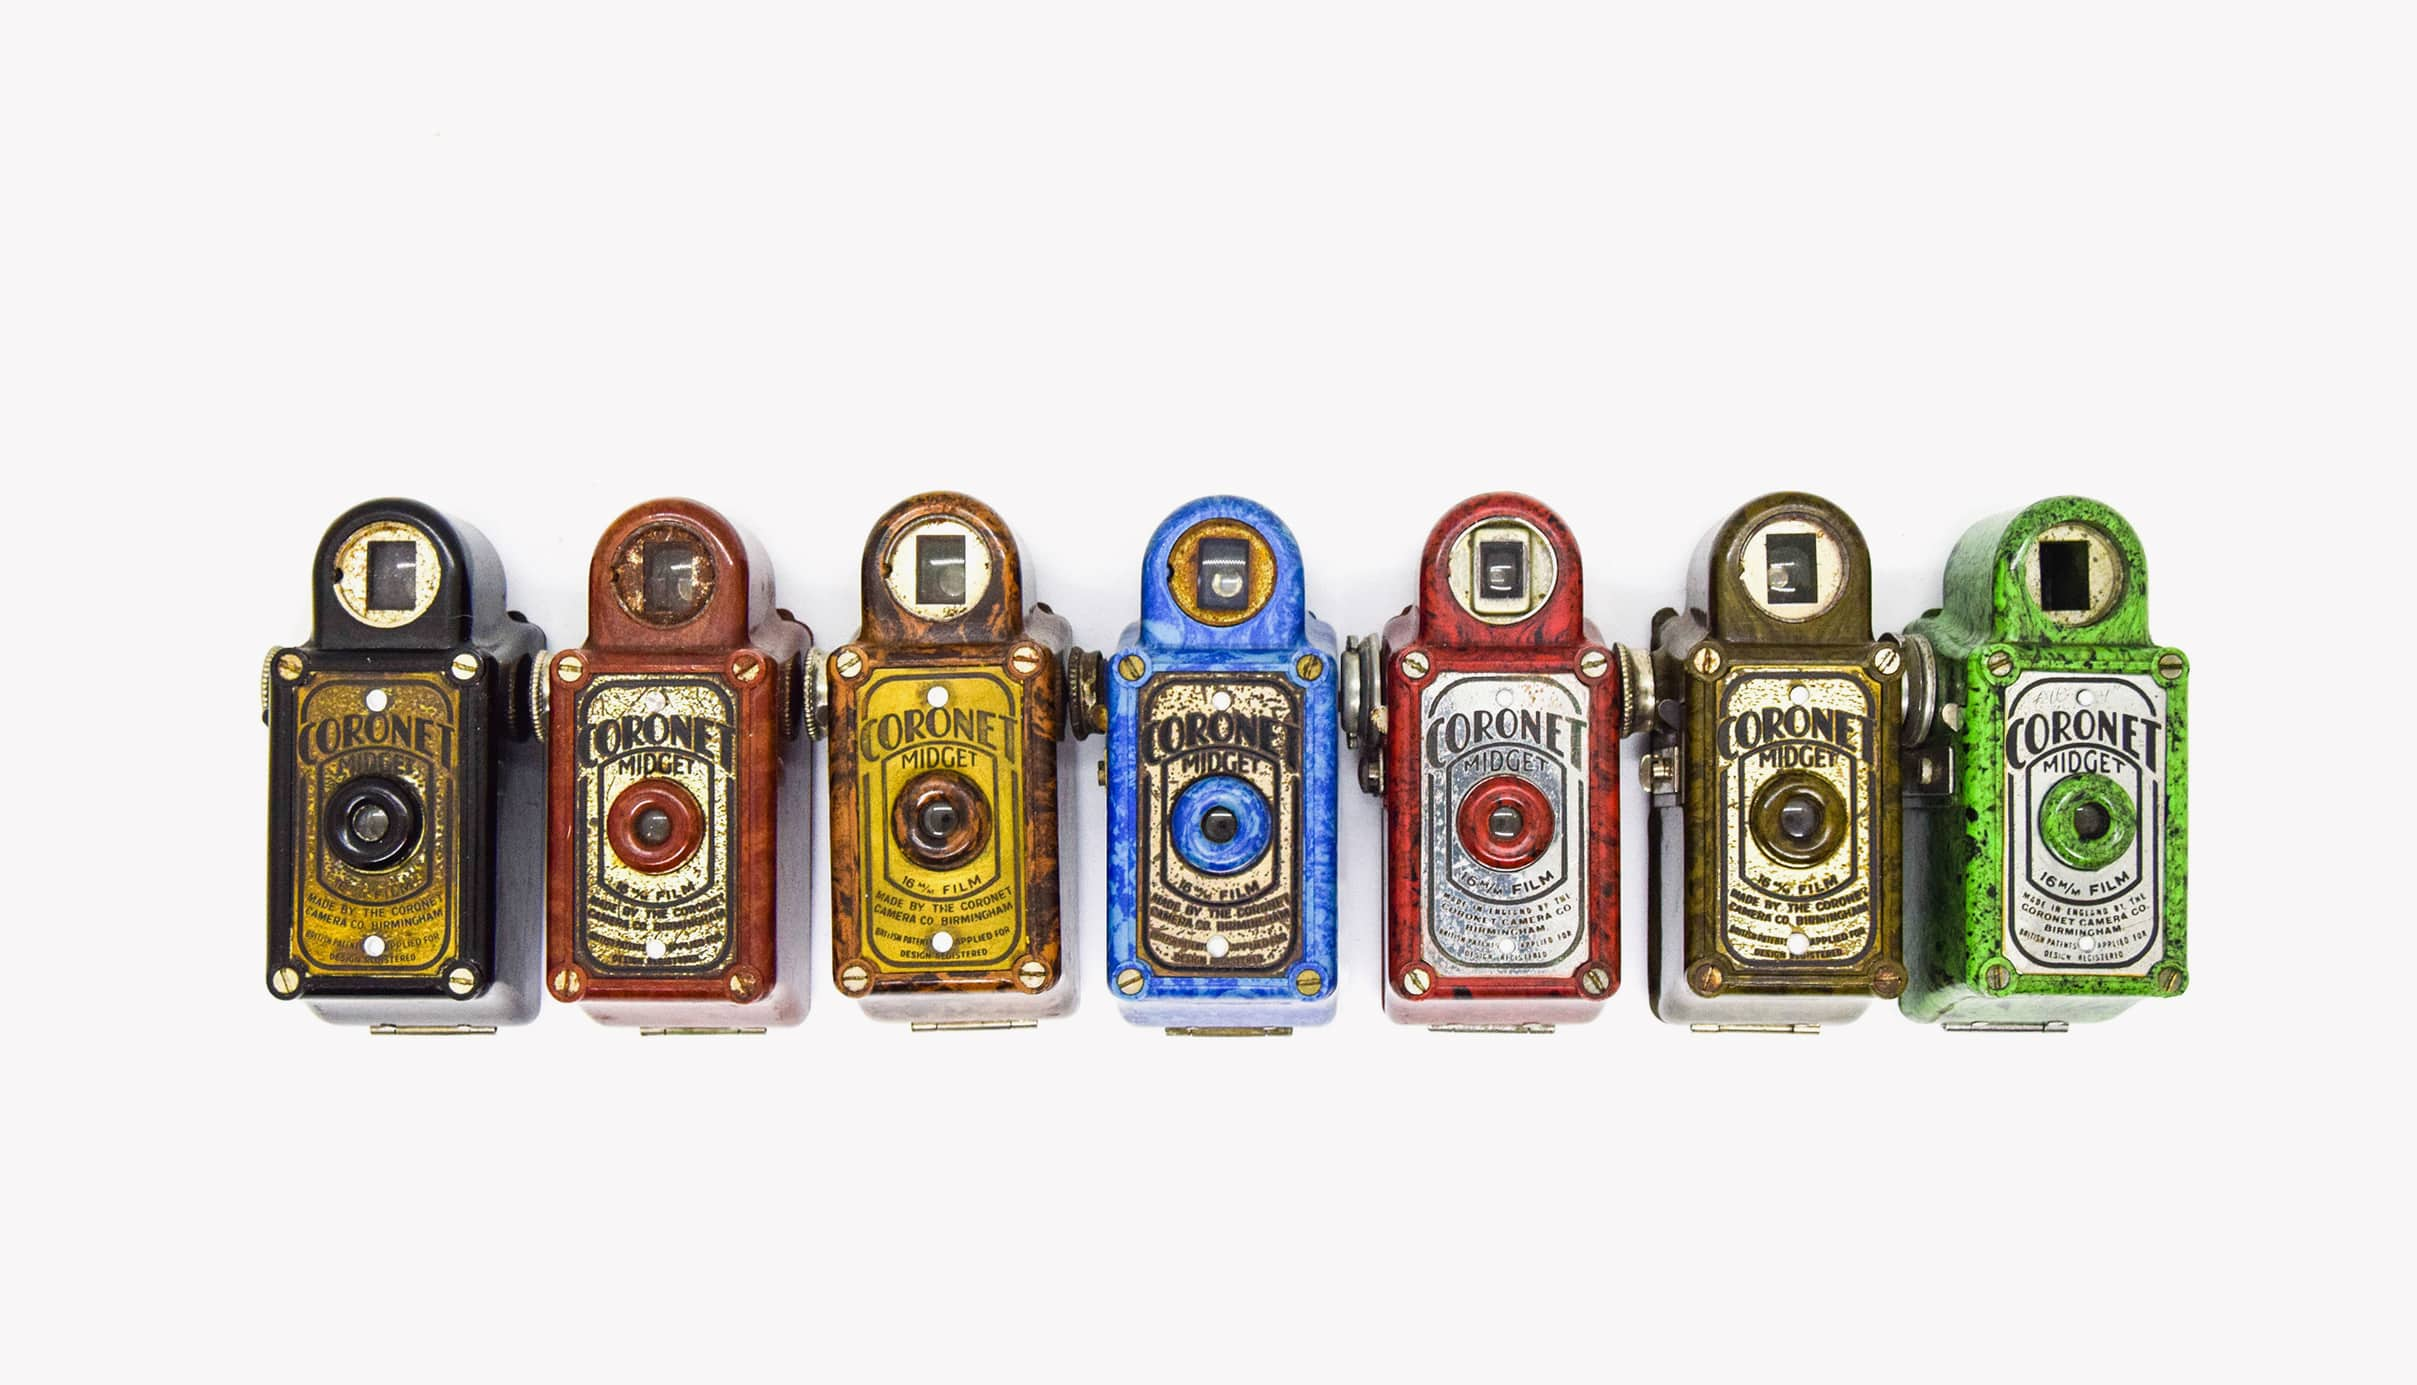 100-years-of-camera-making-1160x665